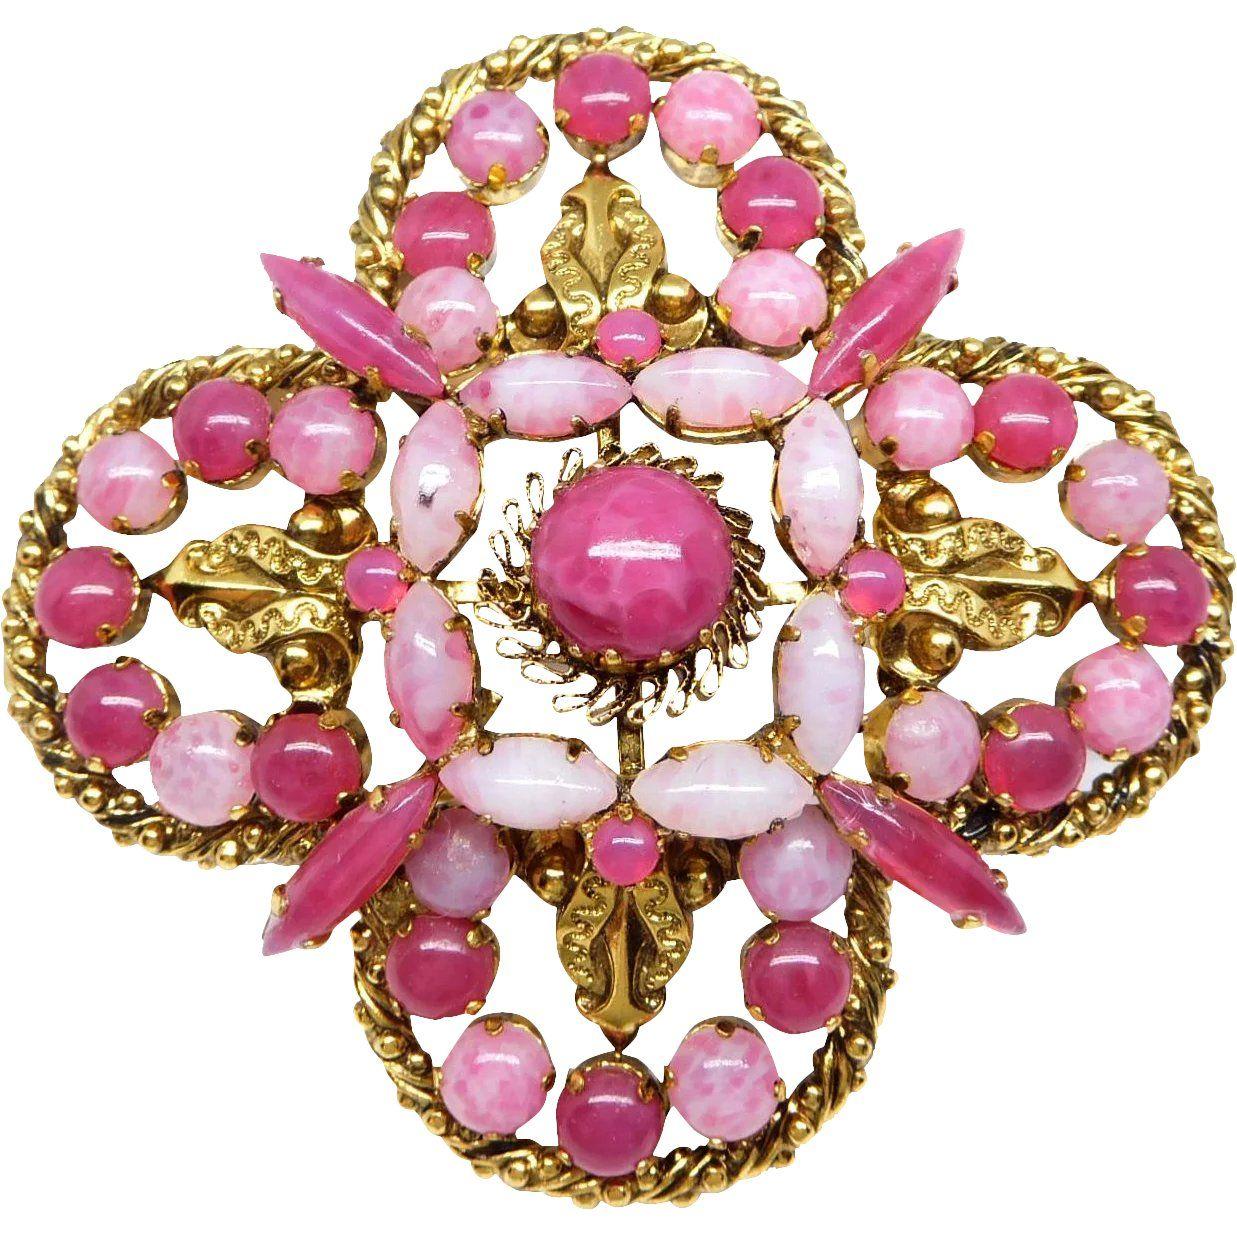 9e0f53de8b963 Vintage Pink Cranberry Art Glass Designer Maltese Cross Brooch ...